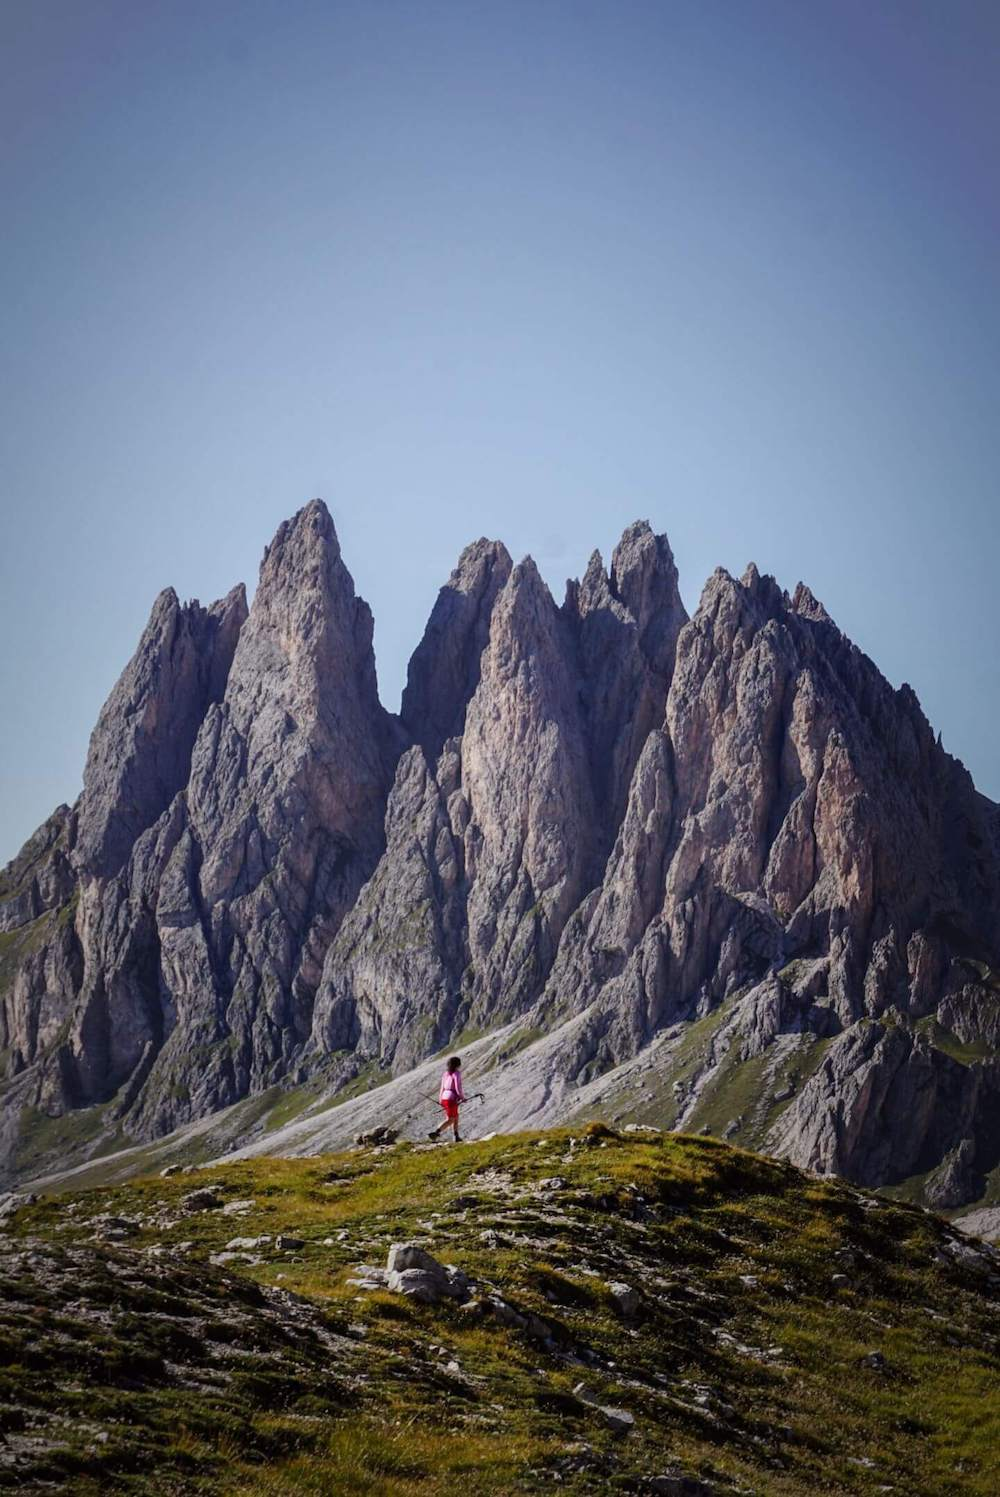 Val Gardena Day Hike - Rifugio Stevia to Col dala Pieres Circuit